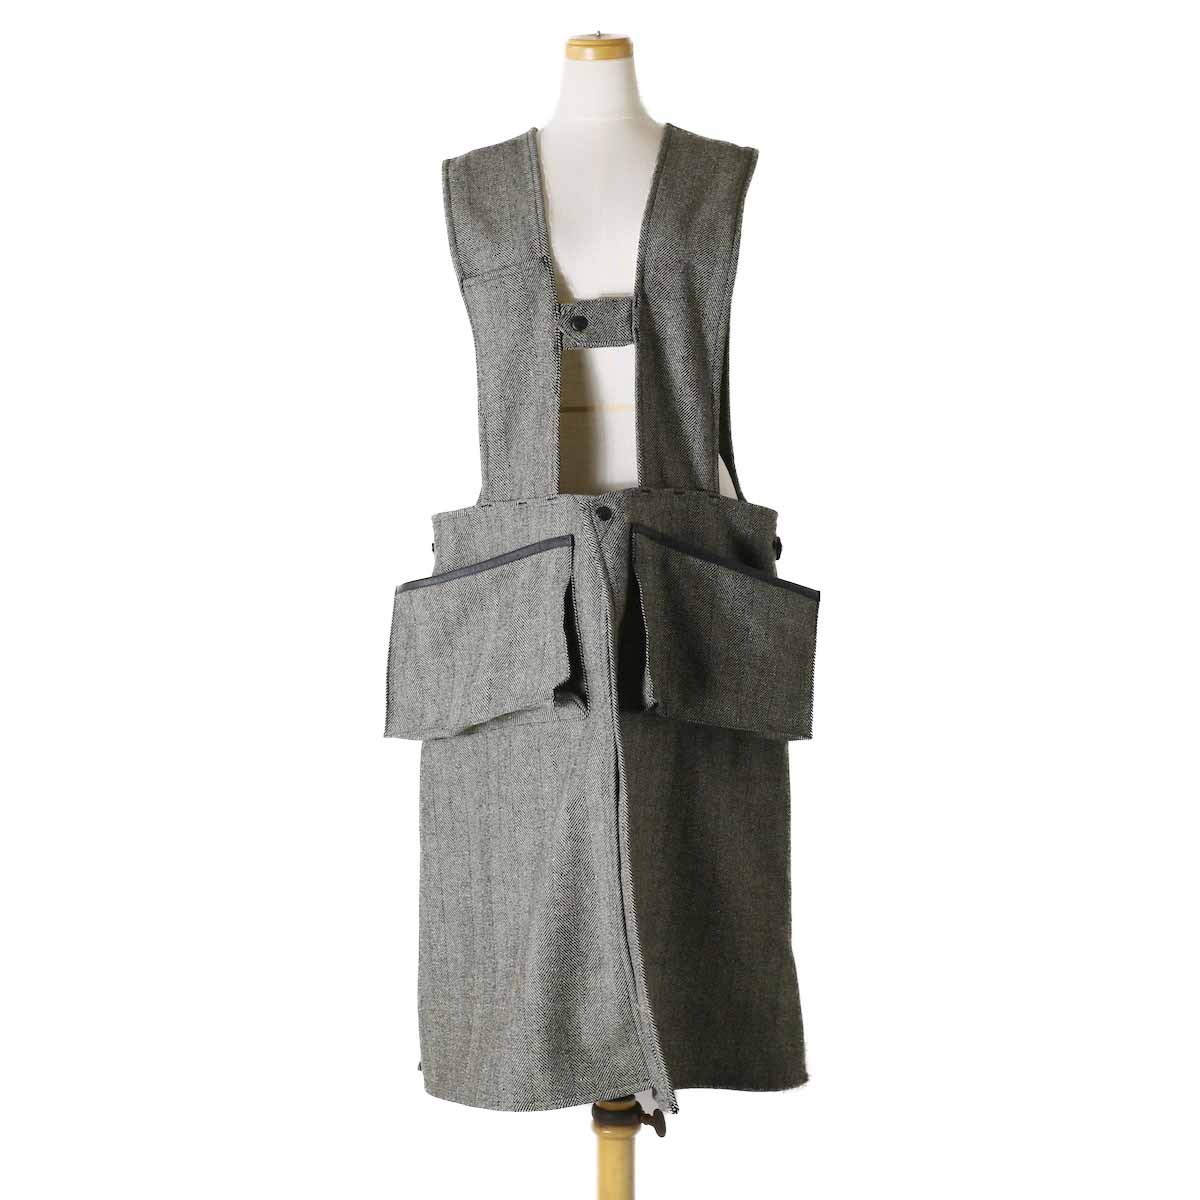 orSlow(Ladies) / Hunting Vest Long -Melton Wool Herringbone Twill(GRAY)